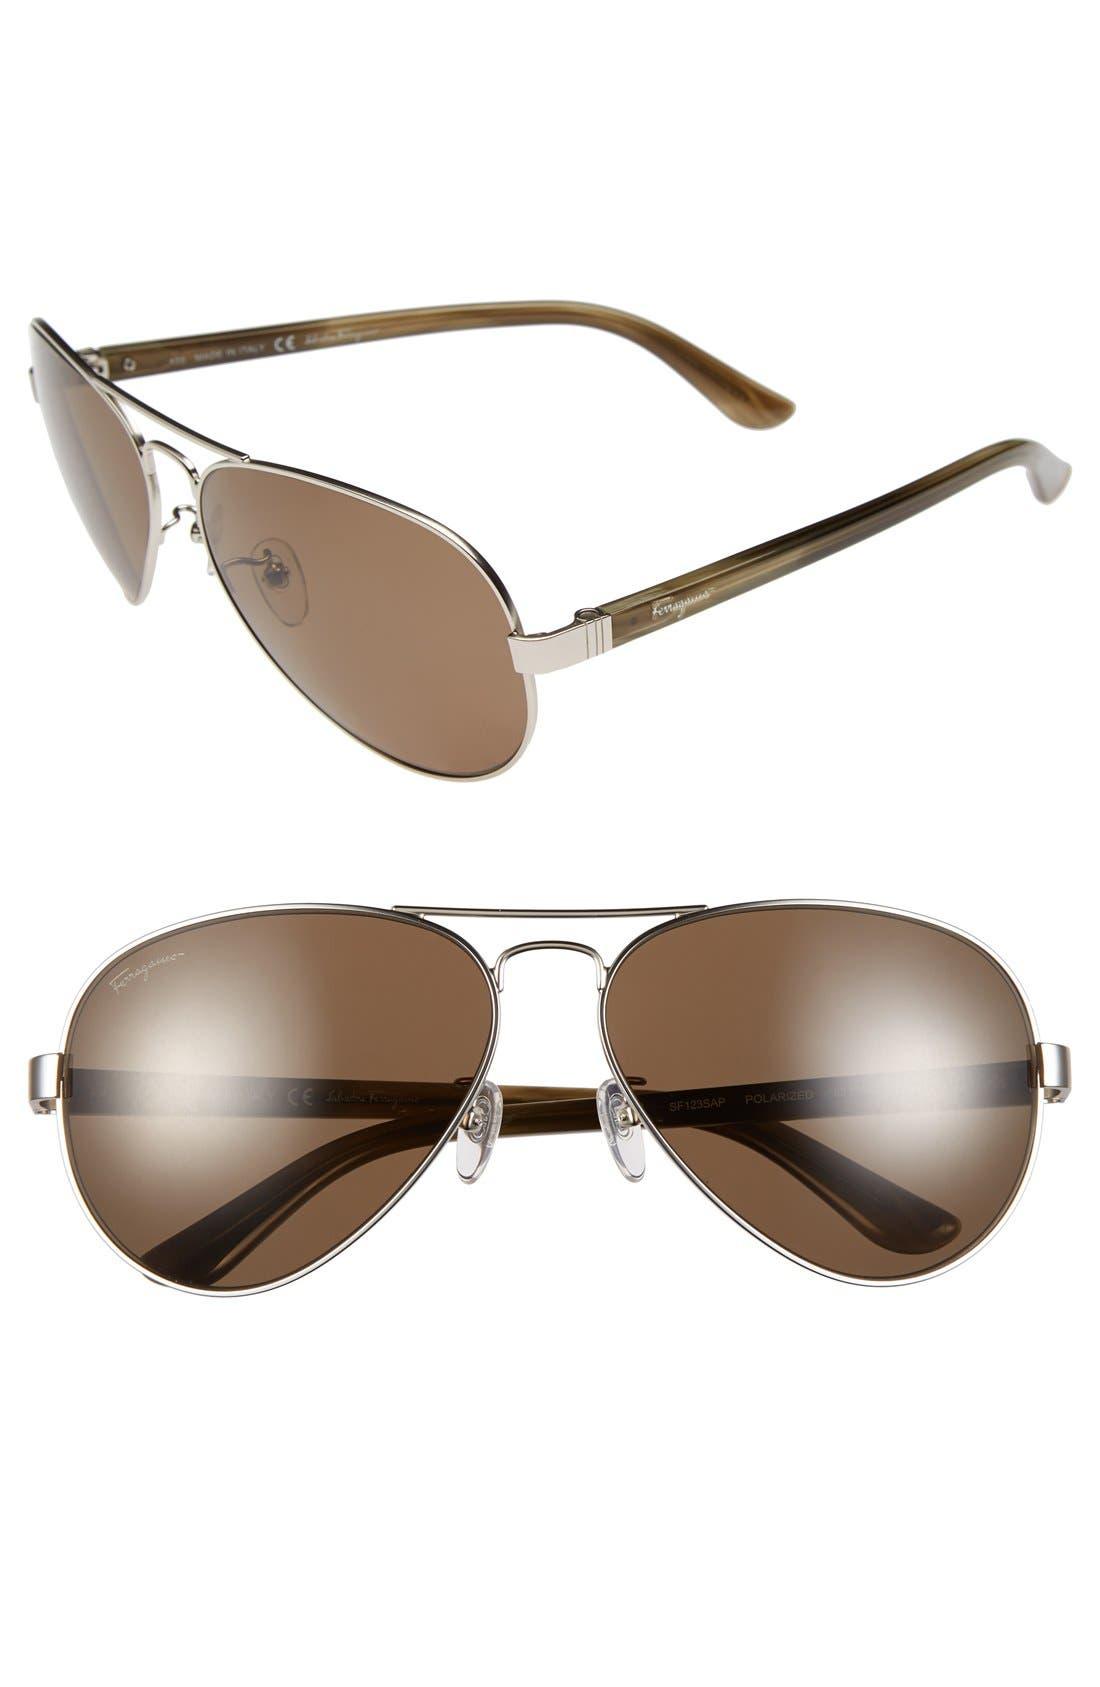 Alternate Image 1 Selected - Salvatore Ferragamo 62mm Aviator Sunglasses